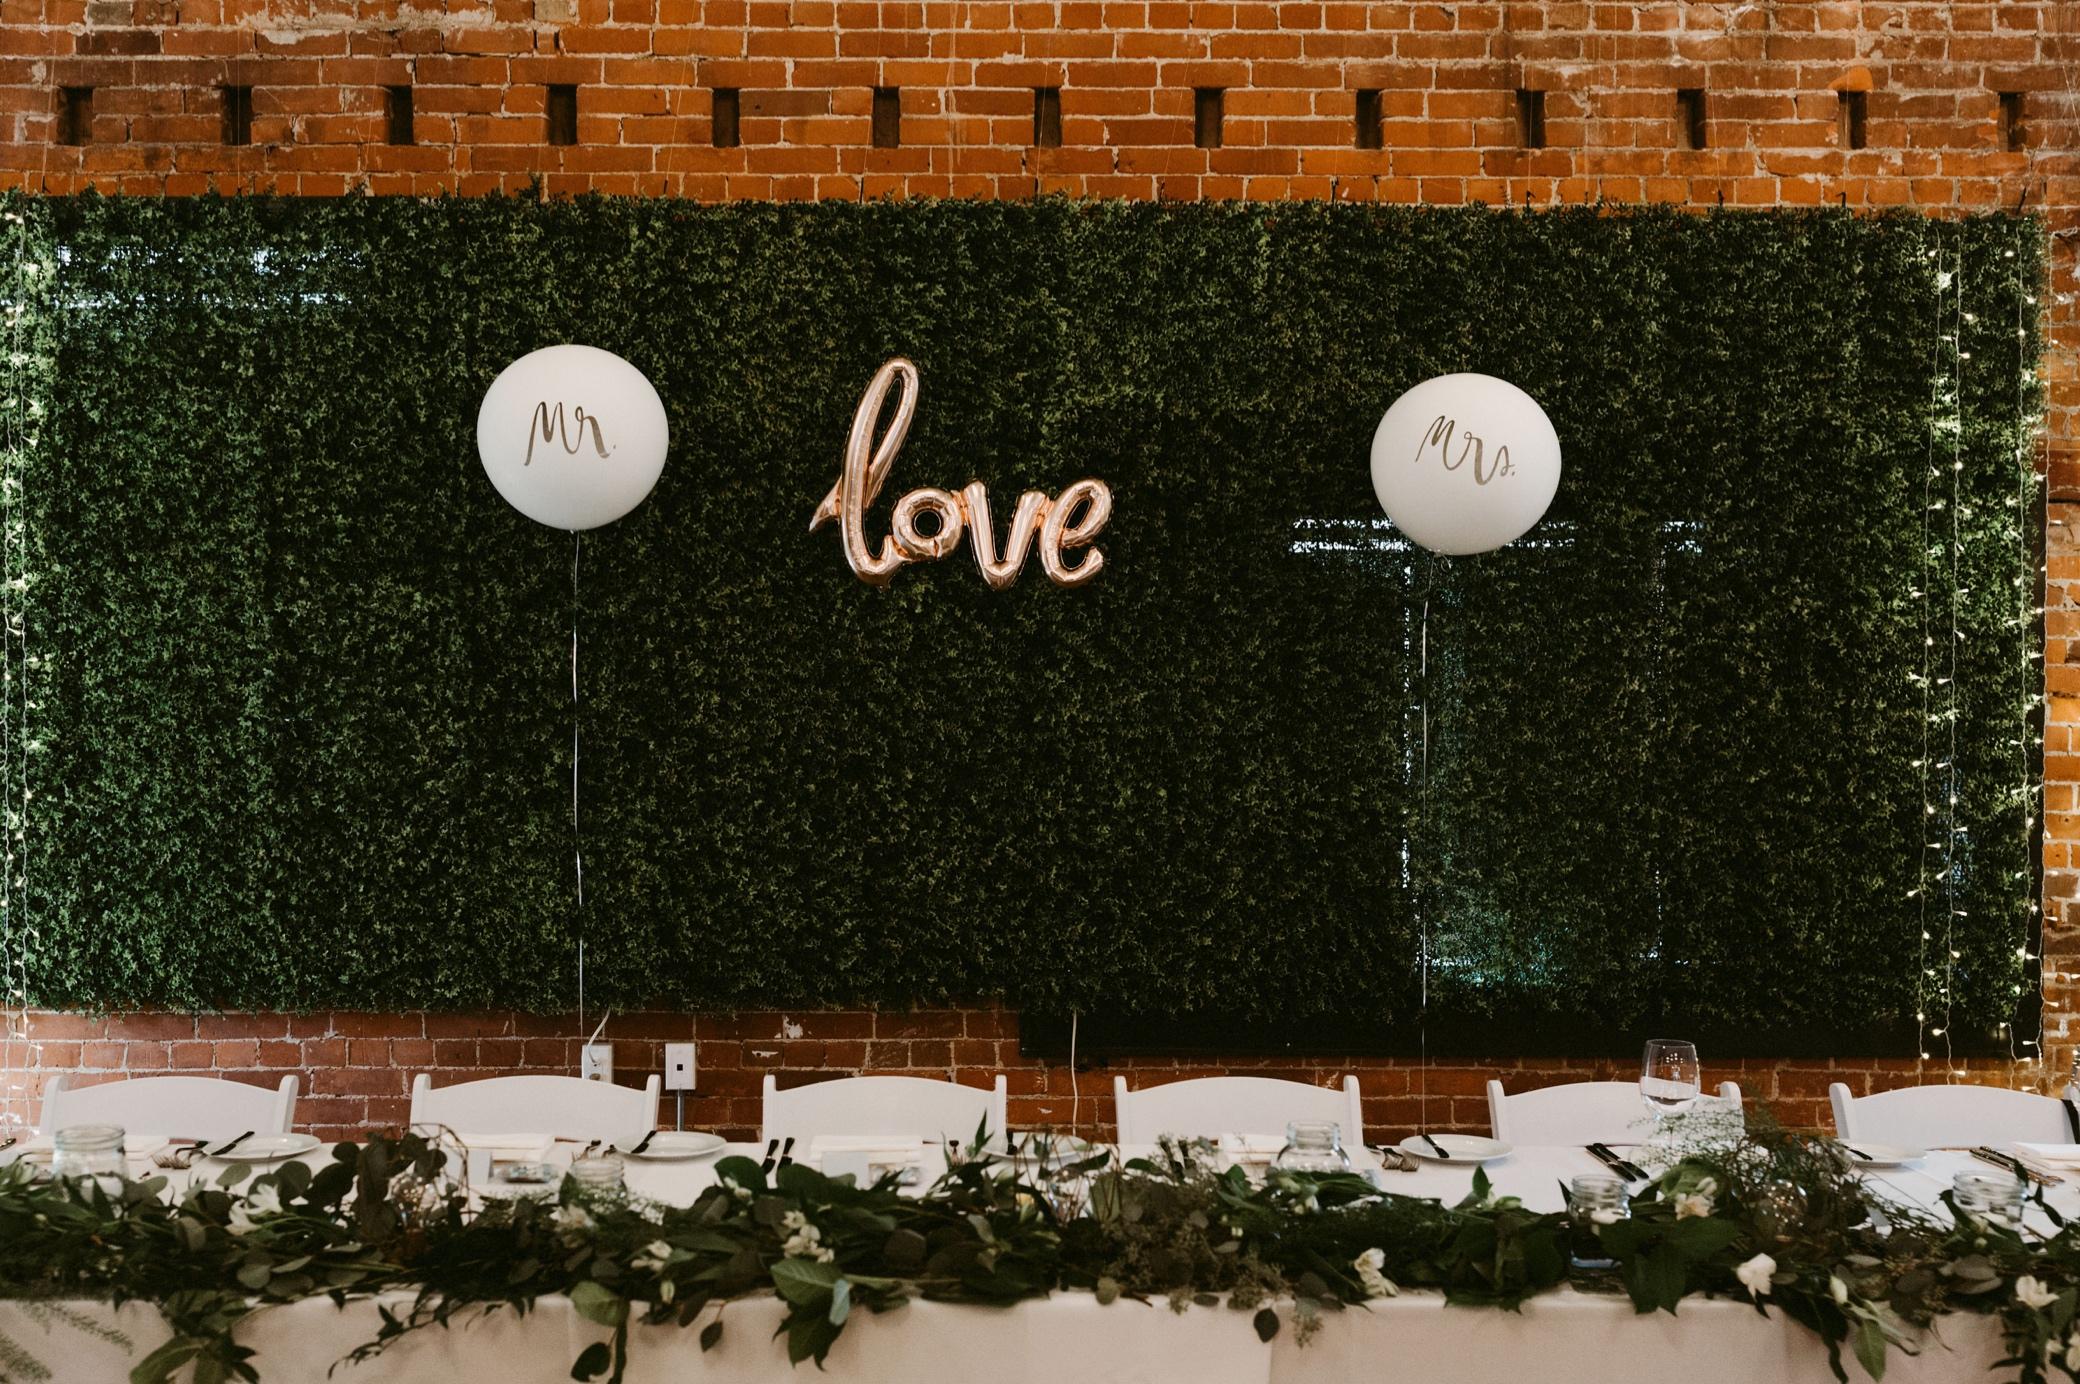 089_The Broadview Hotel Wedding (498 of 913).jpg